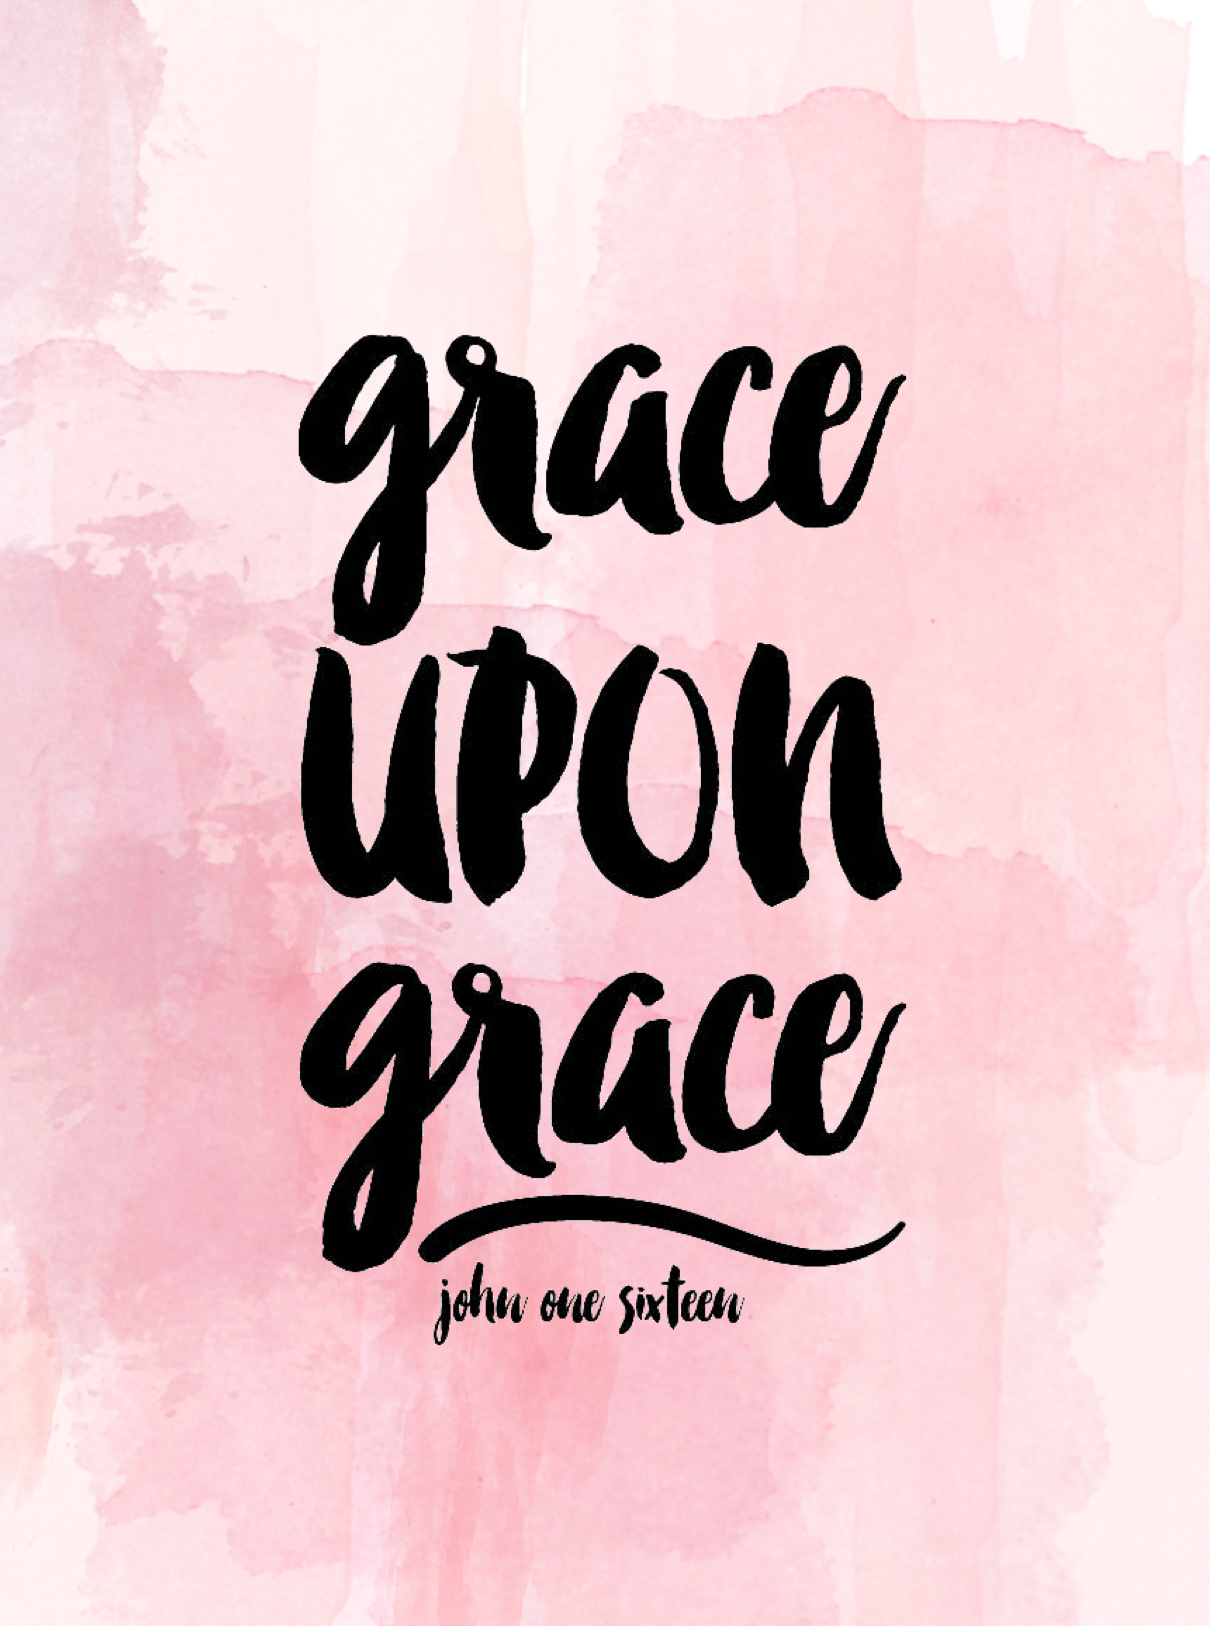 grace upon grace John 1:16 wallpaper | christian wallpaper, bible verse wallpaper, iPhone ...